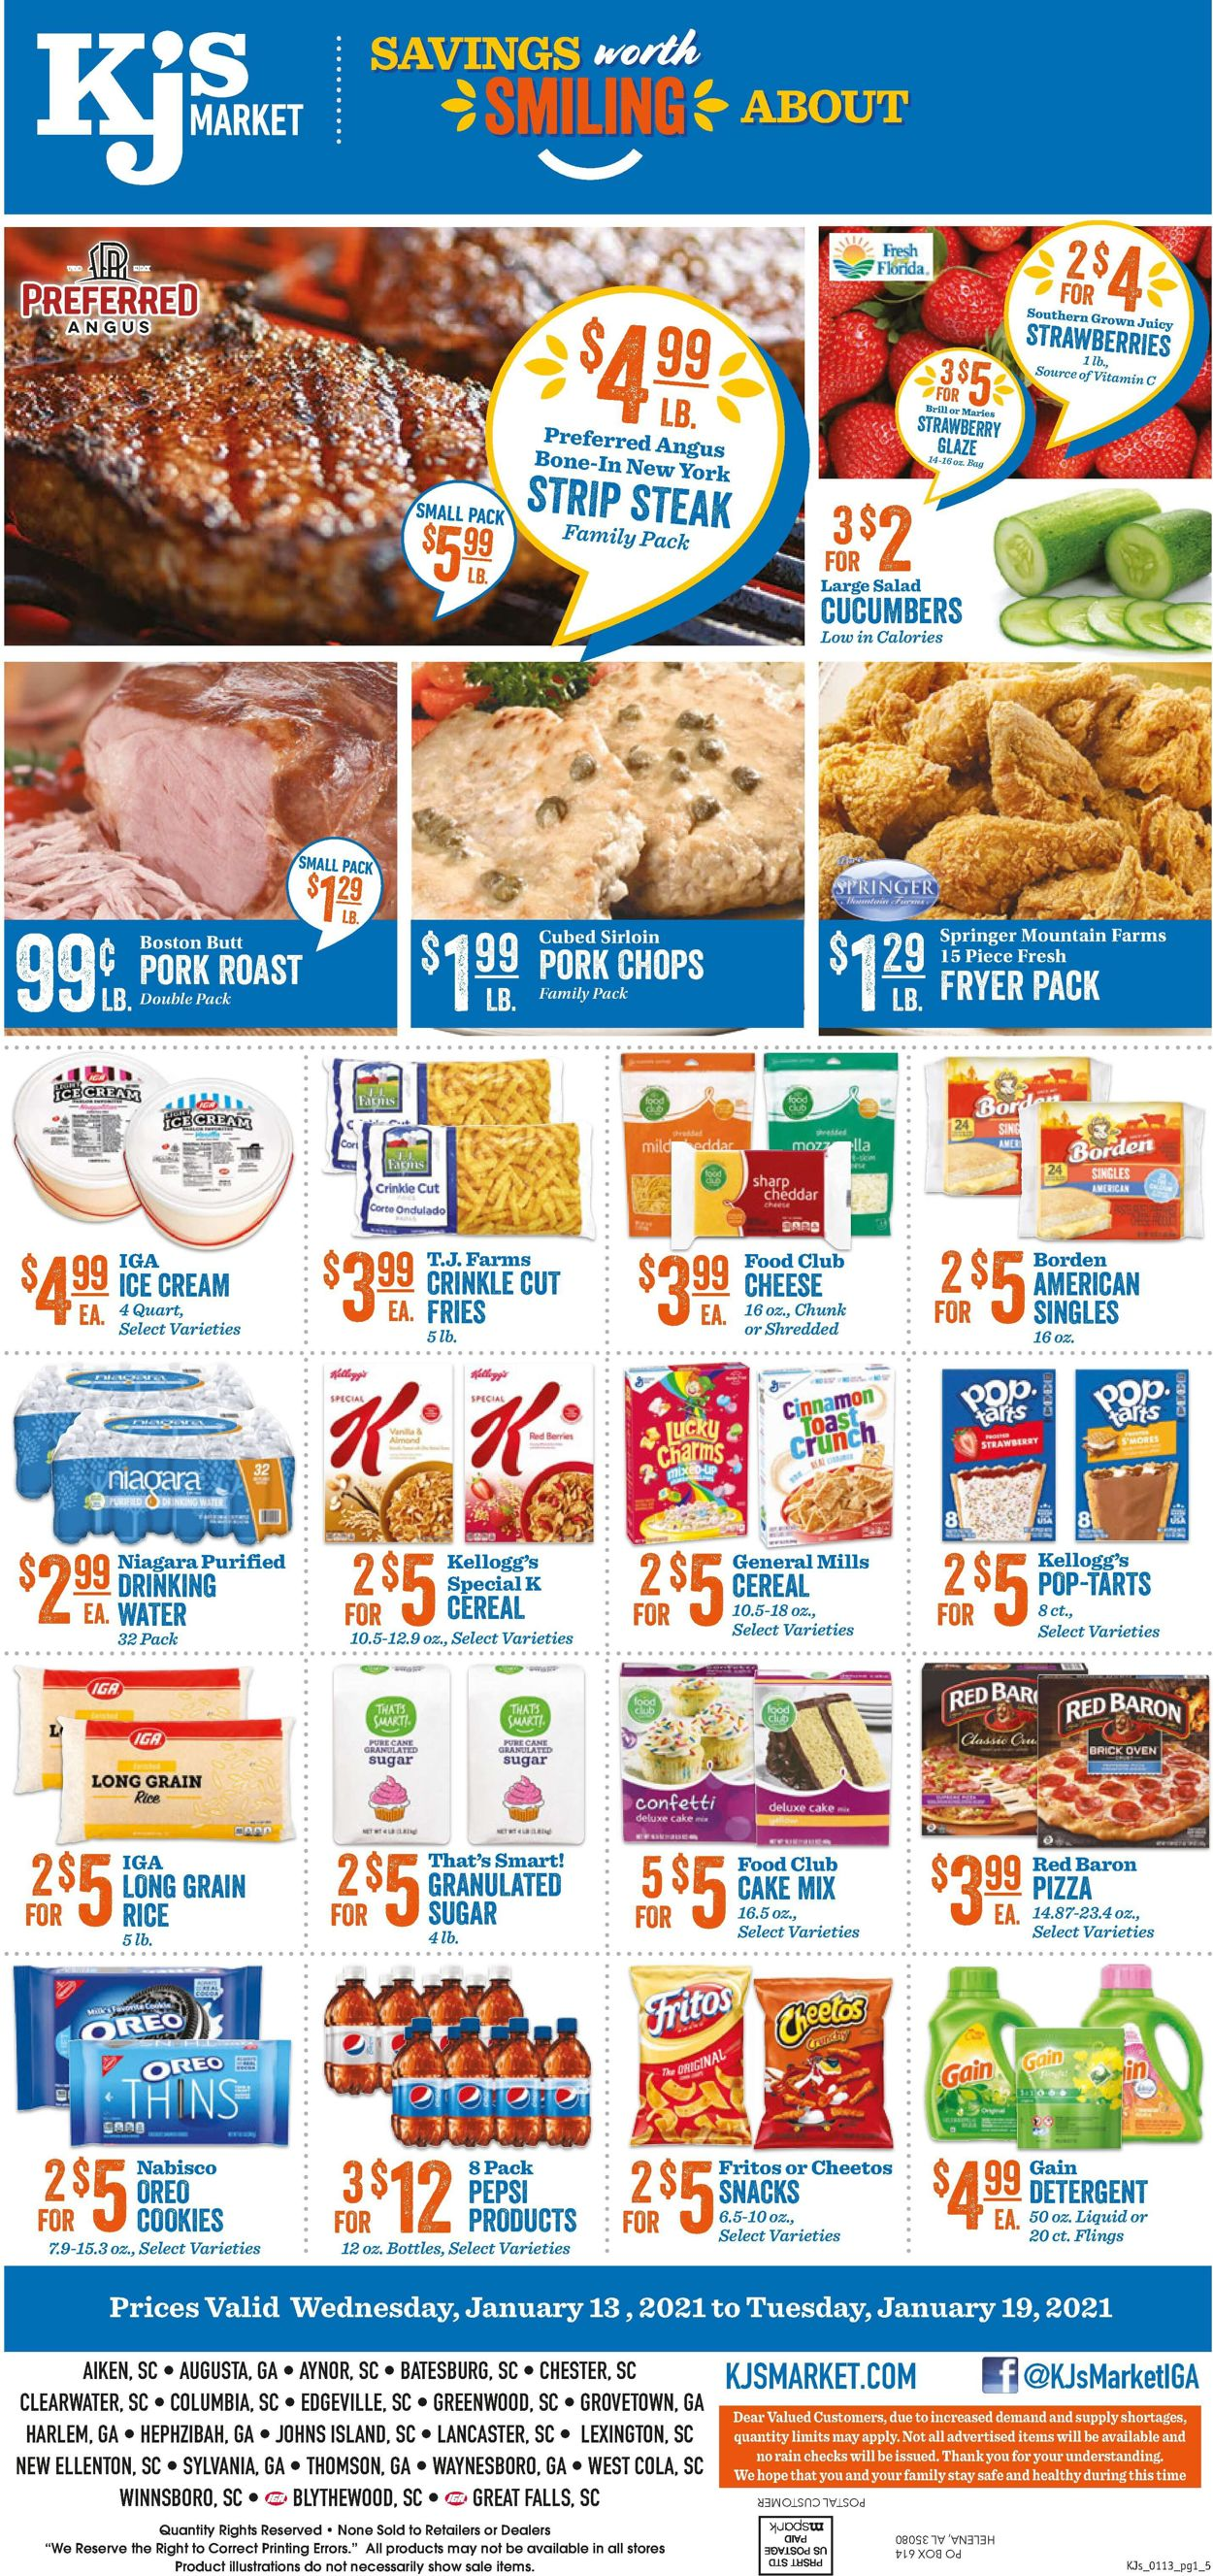 KJ´s Market Weekly Ad Circular - valid 01/13-01/19/2021